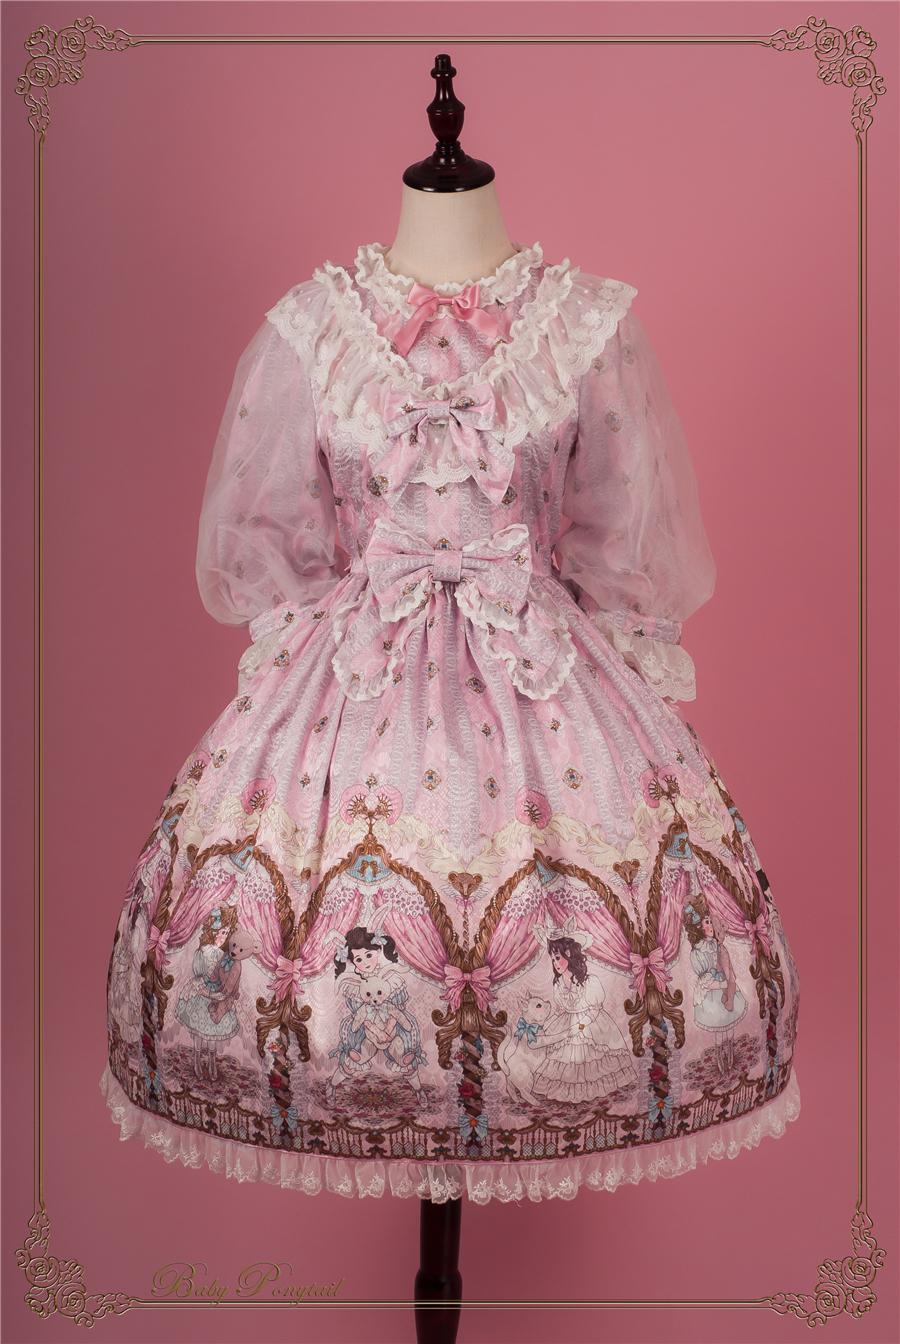 BabyPonytail_Stock Photo_My Favorite Companion_OP Pink_0.jpg